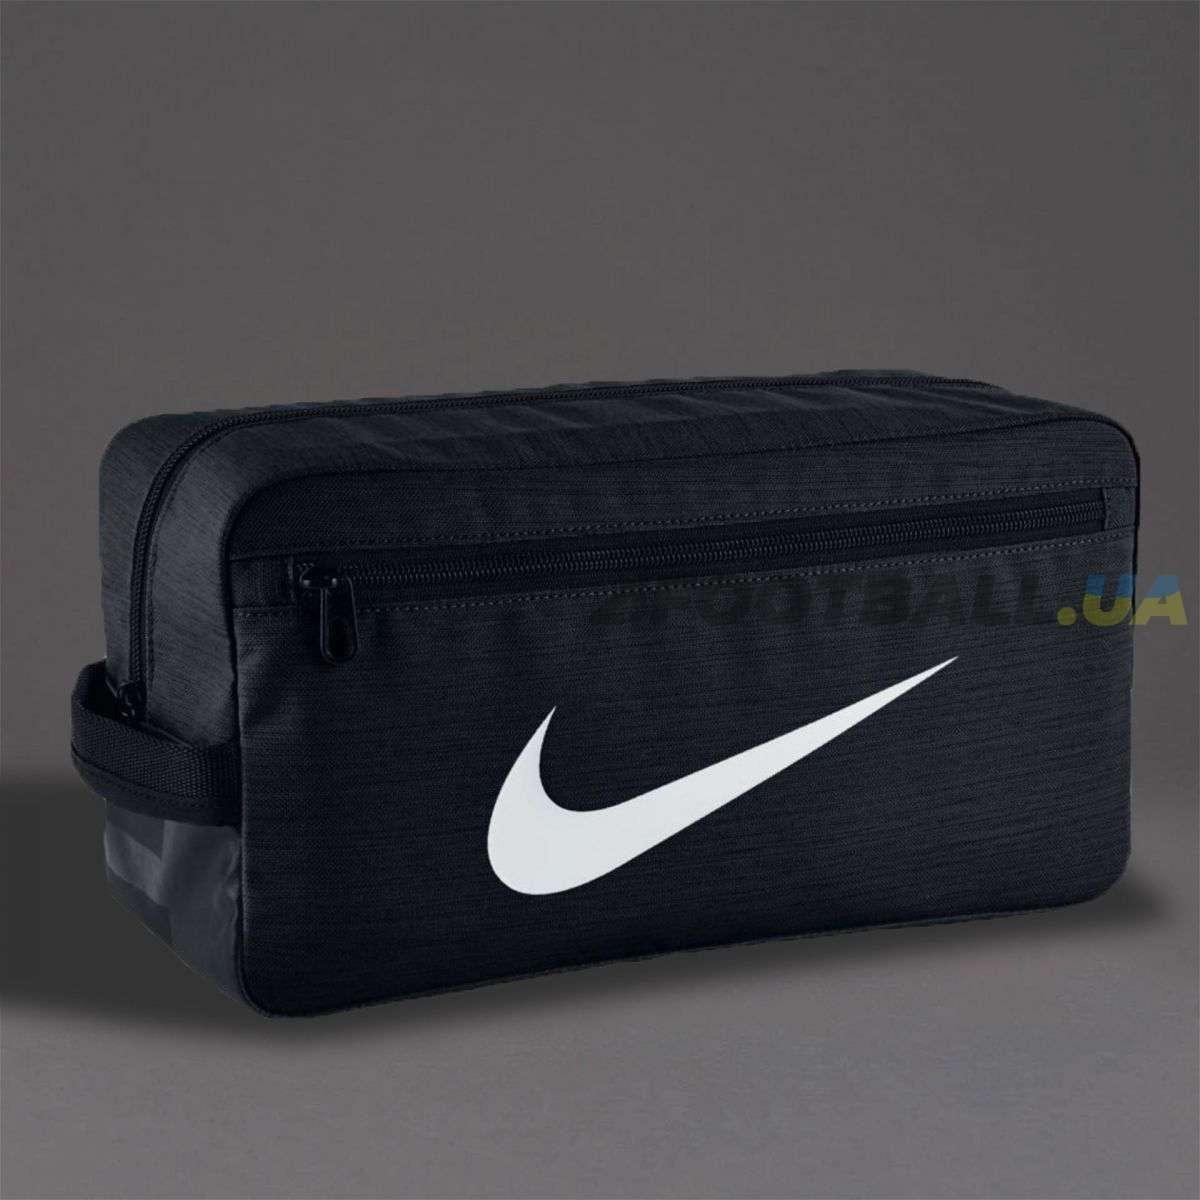 4884e1887099 Сумка для обуви Nike NK BRSLA SHOE ba5339 купить у надежного ...